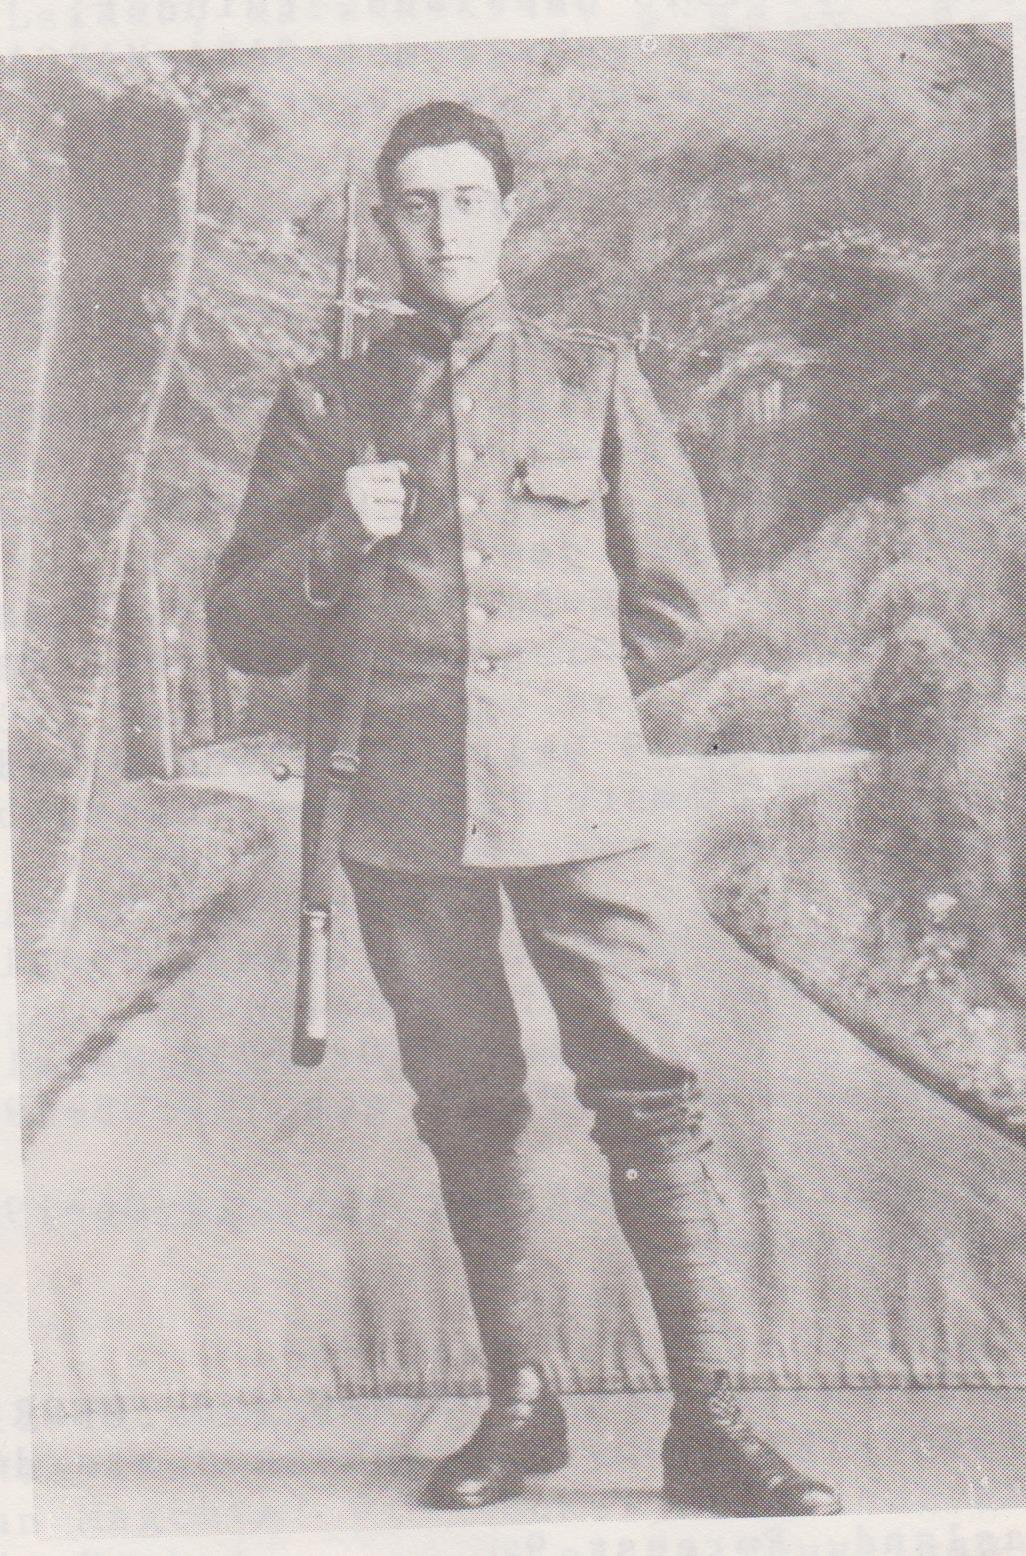 Pieter Buitelaar 1912-1940